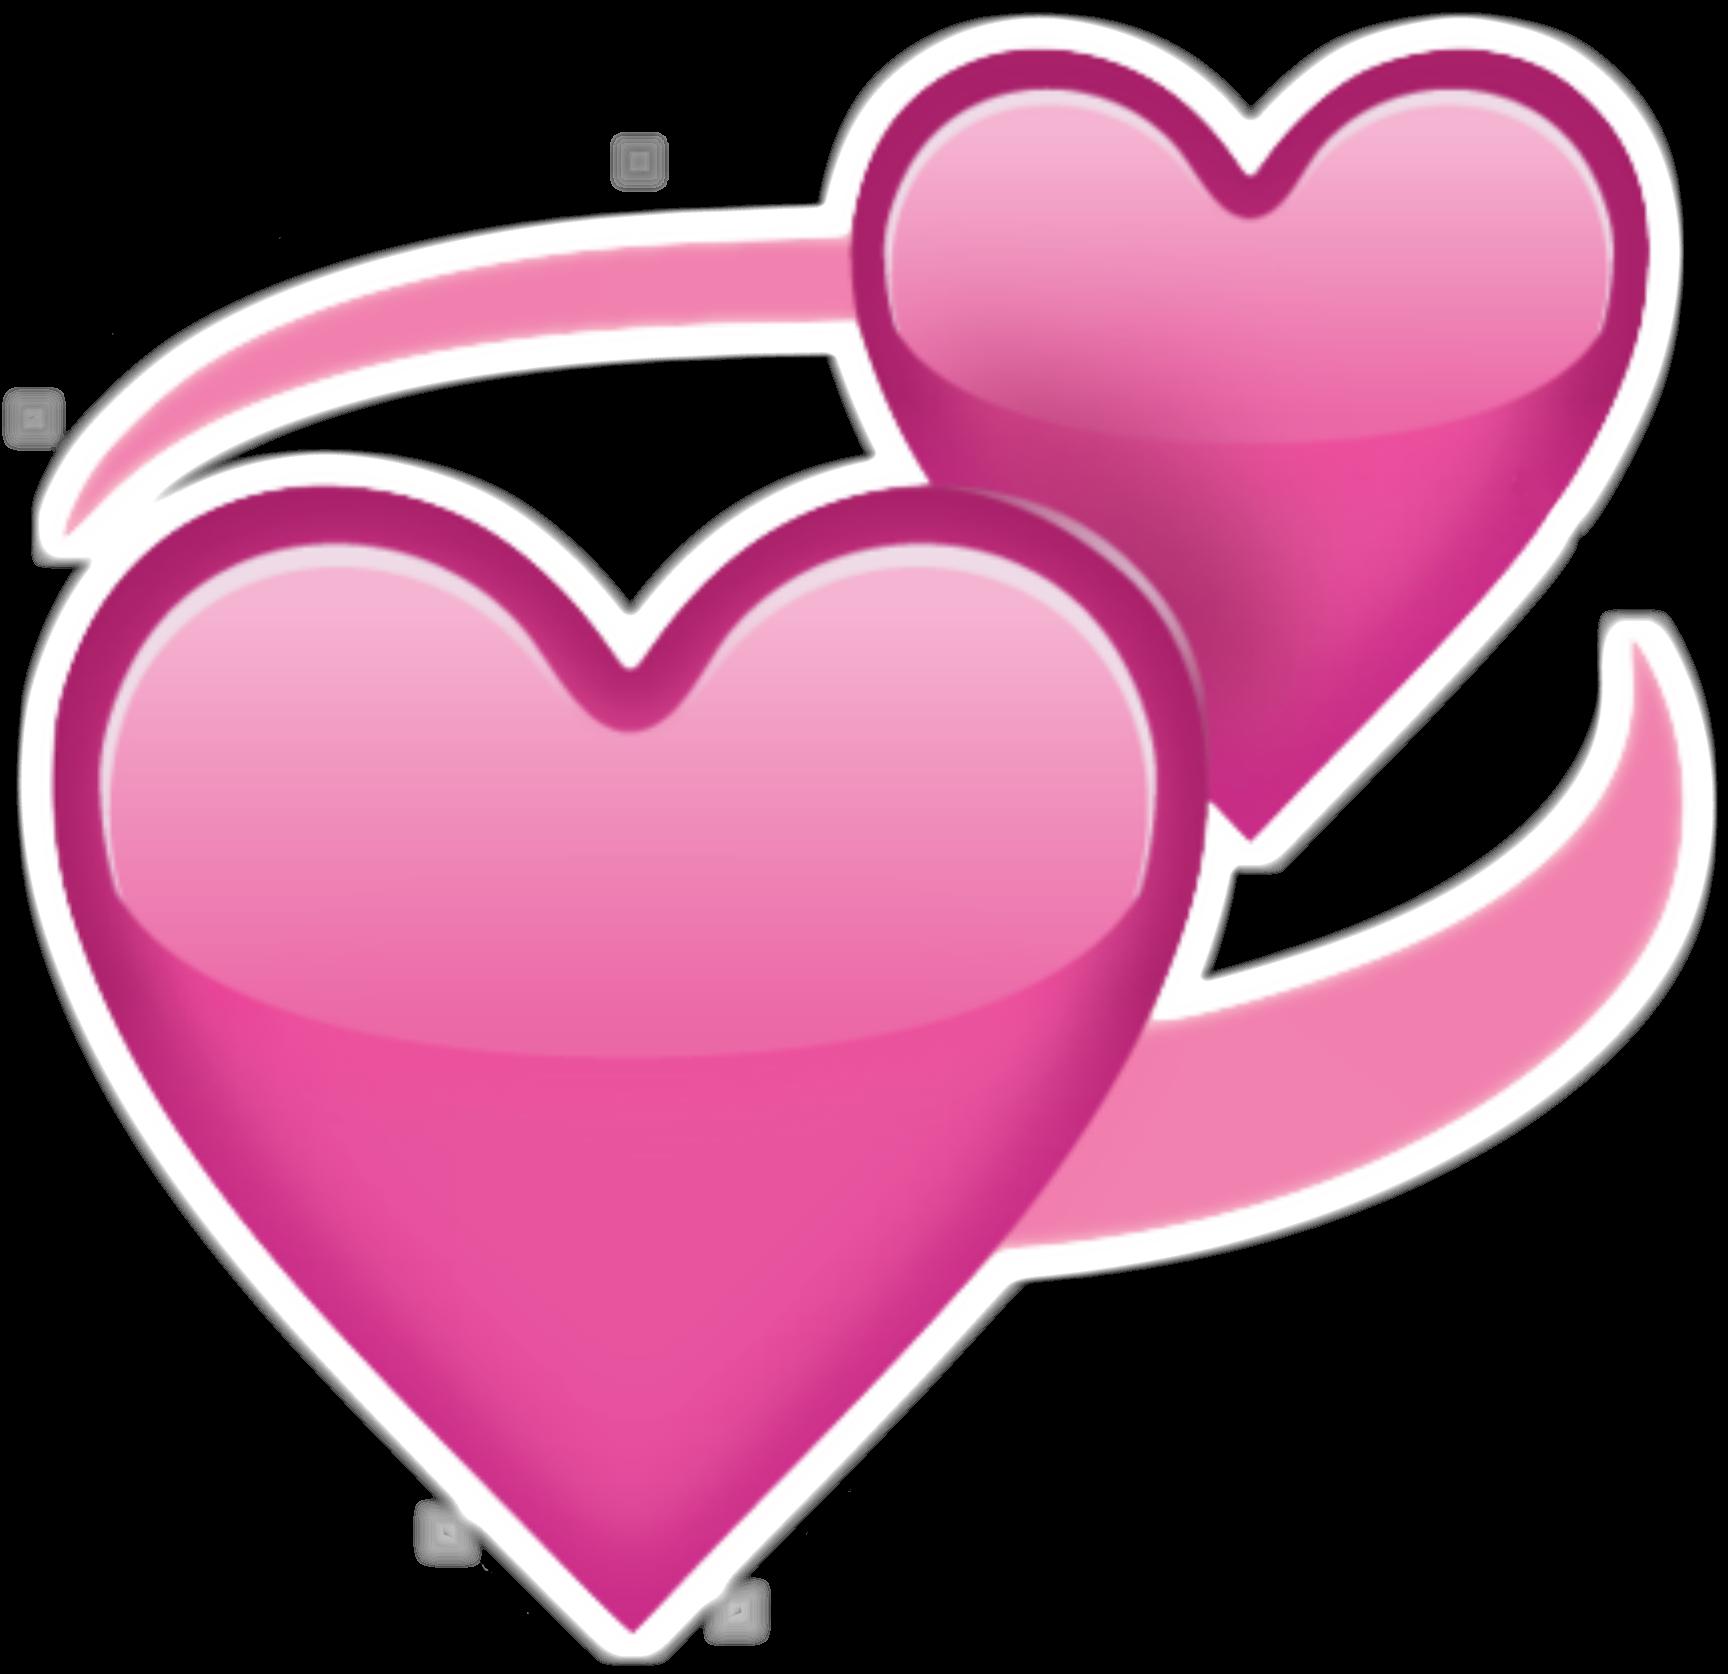 Pink hearts png. Two emoji transparent